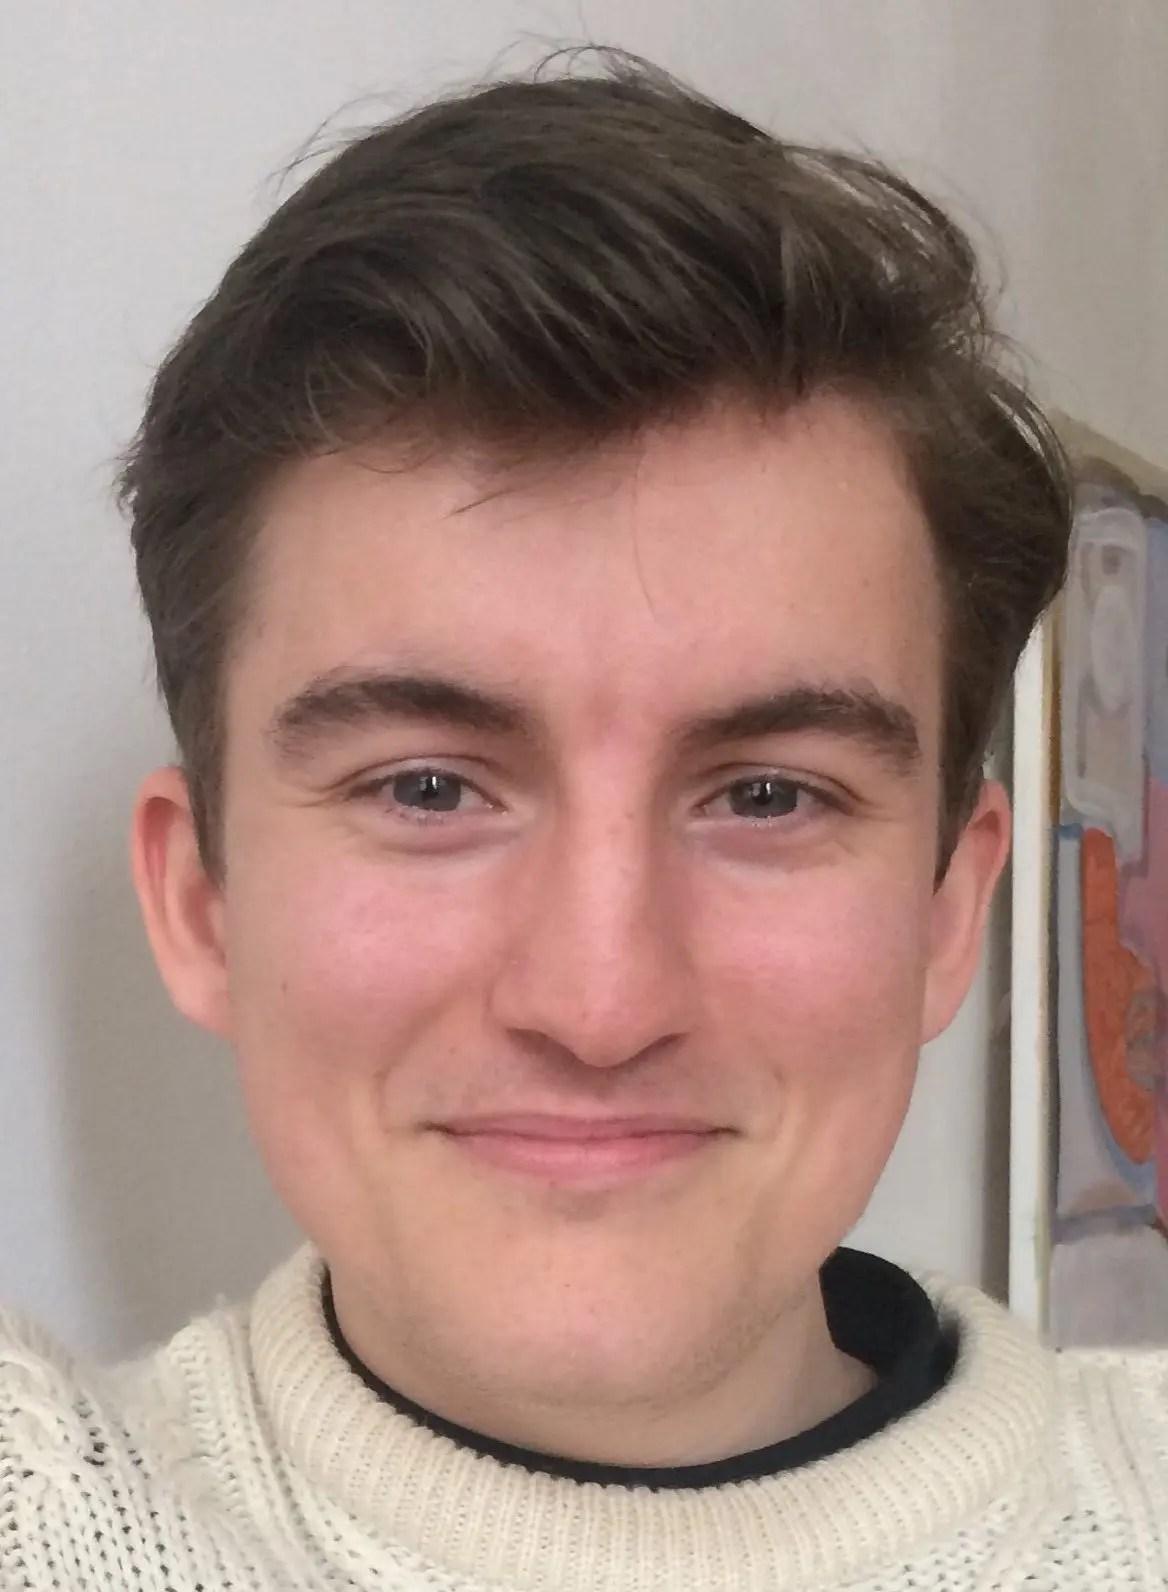 Cameron Evans: Dismantling the 'Network'